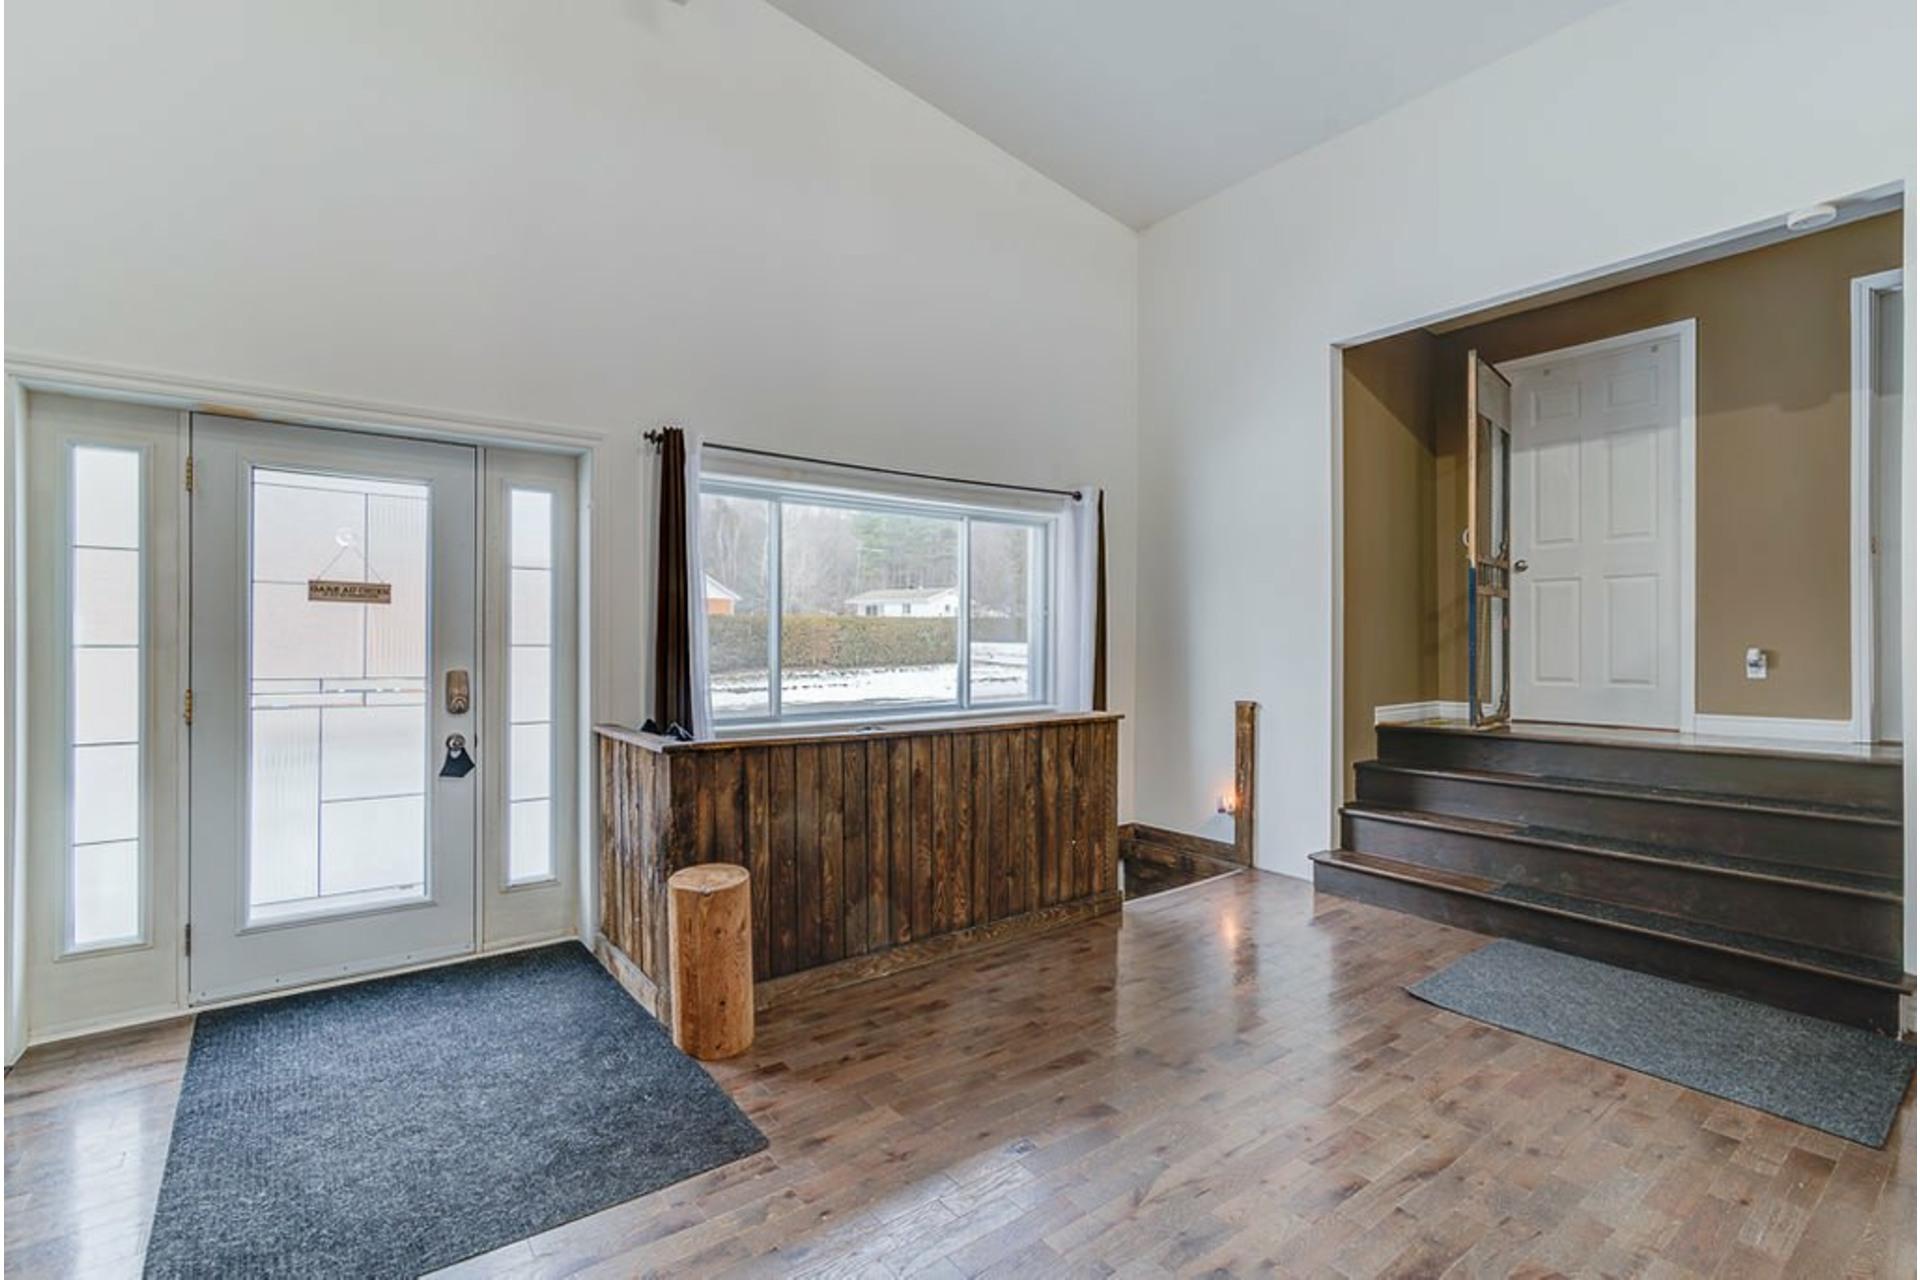 image 1 - House For sale Sainte-Julienne - 7 rooms